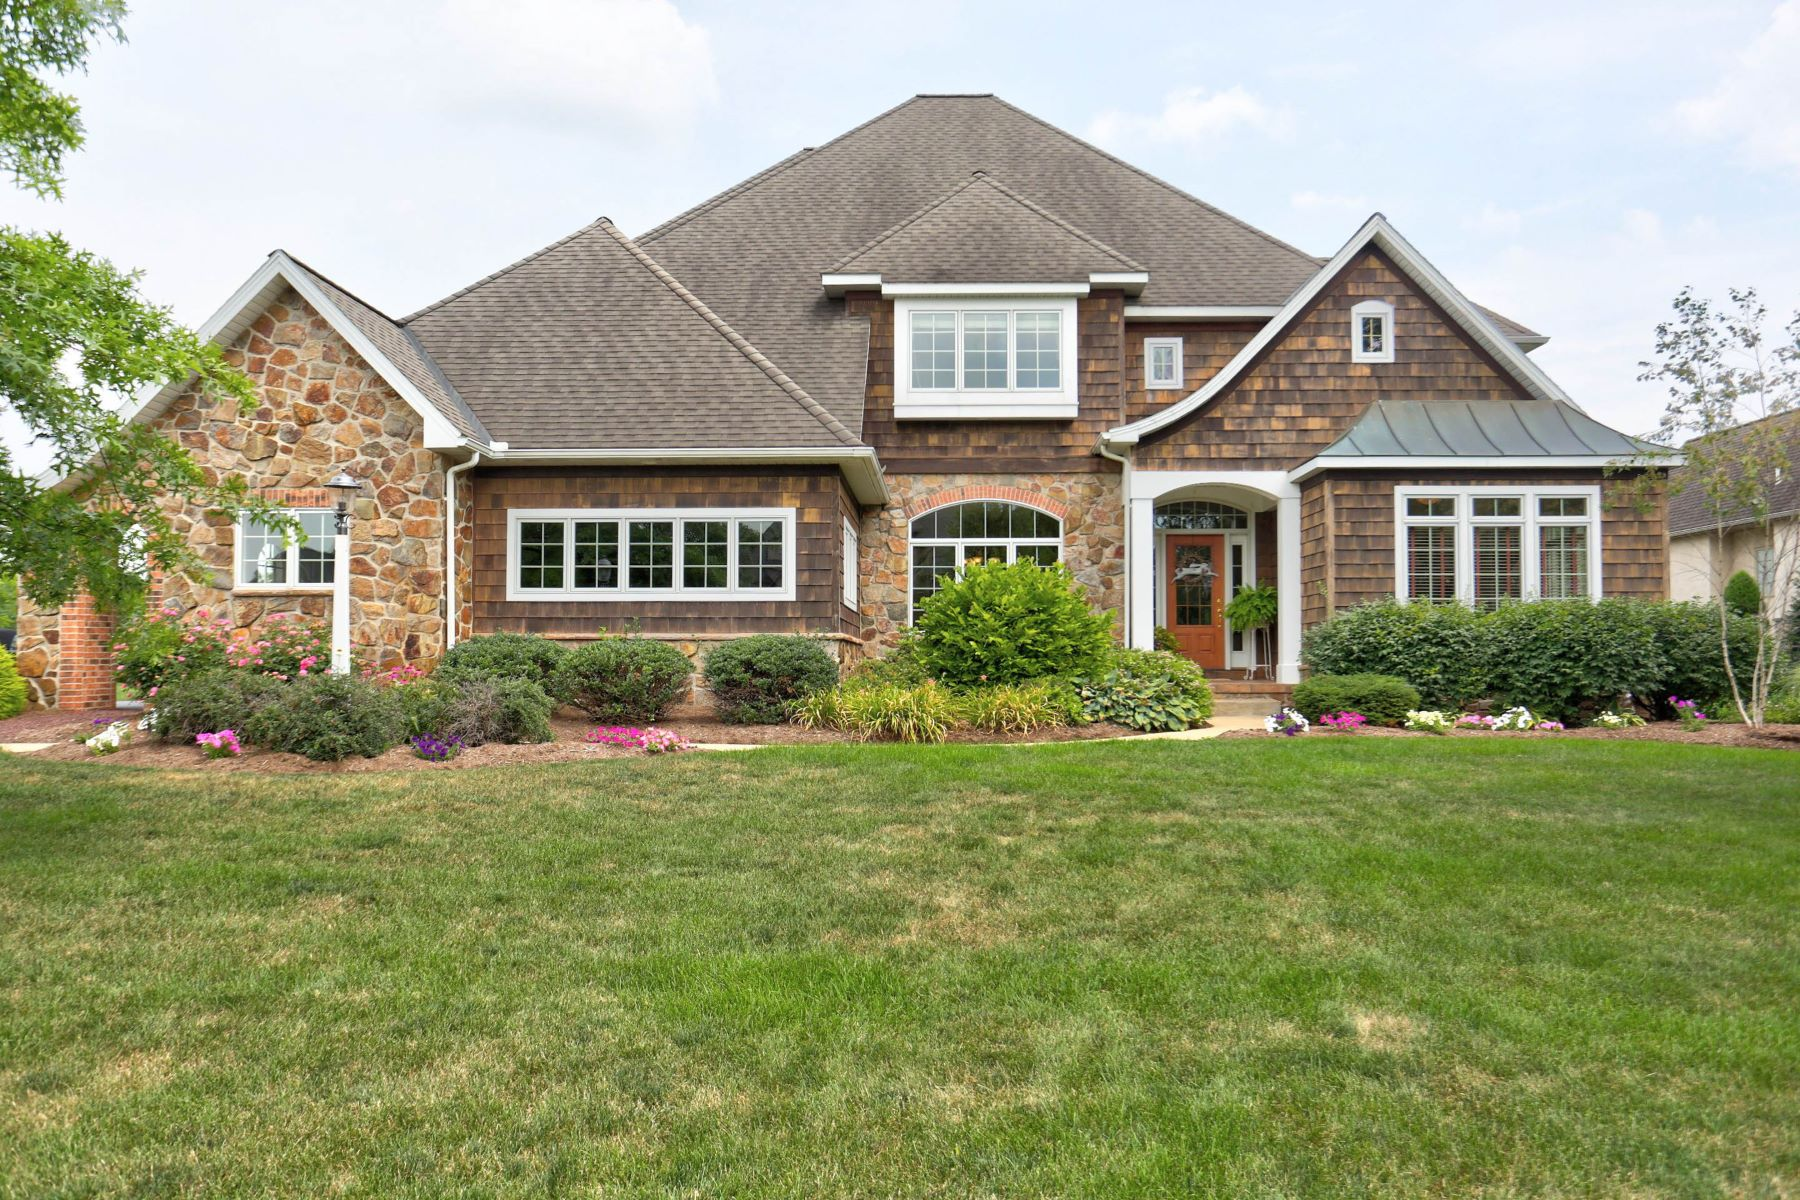 Single Family Home for Sale at 506 Wheatfield Drive Lititz, Pennsylvania, 17543 United States